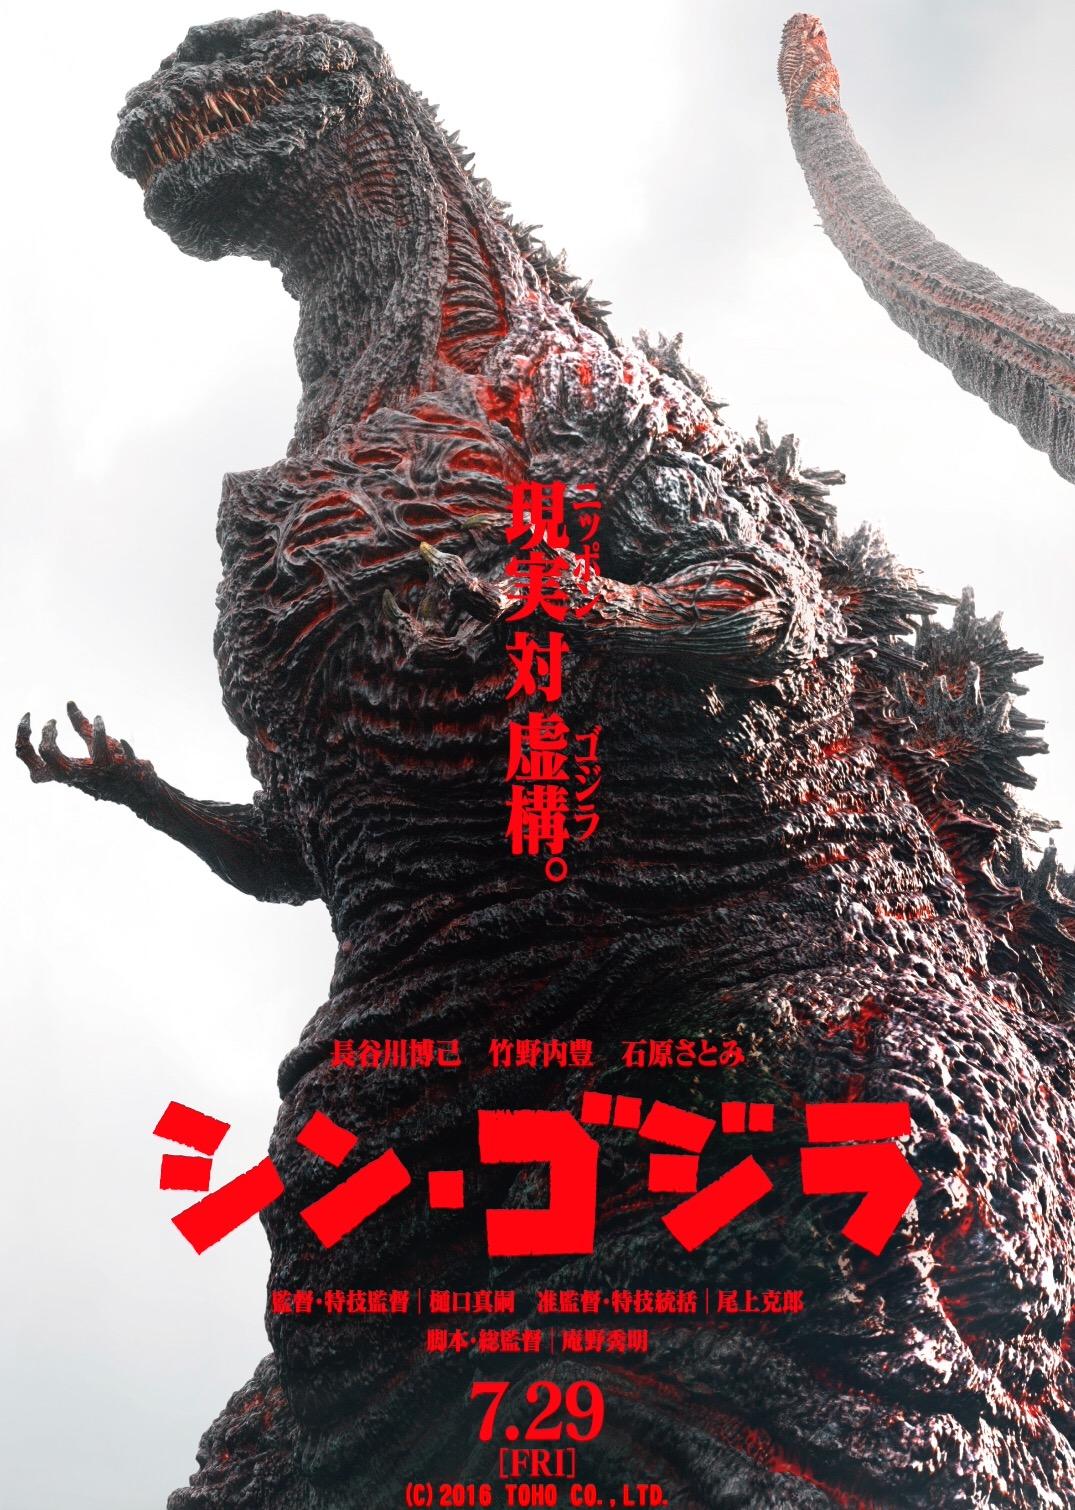 Godzilla Resurgence (2016) Technical Specifications